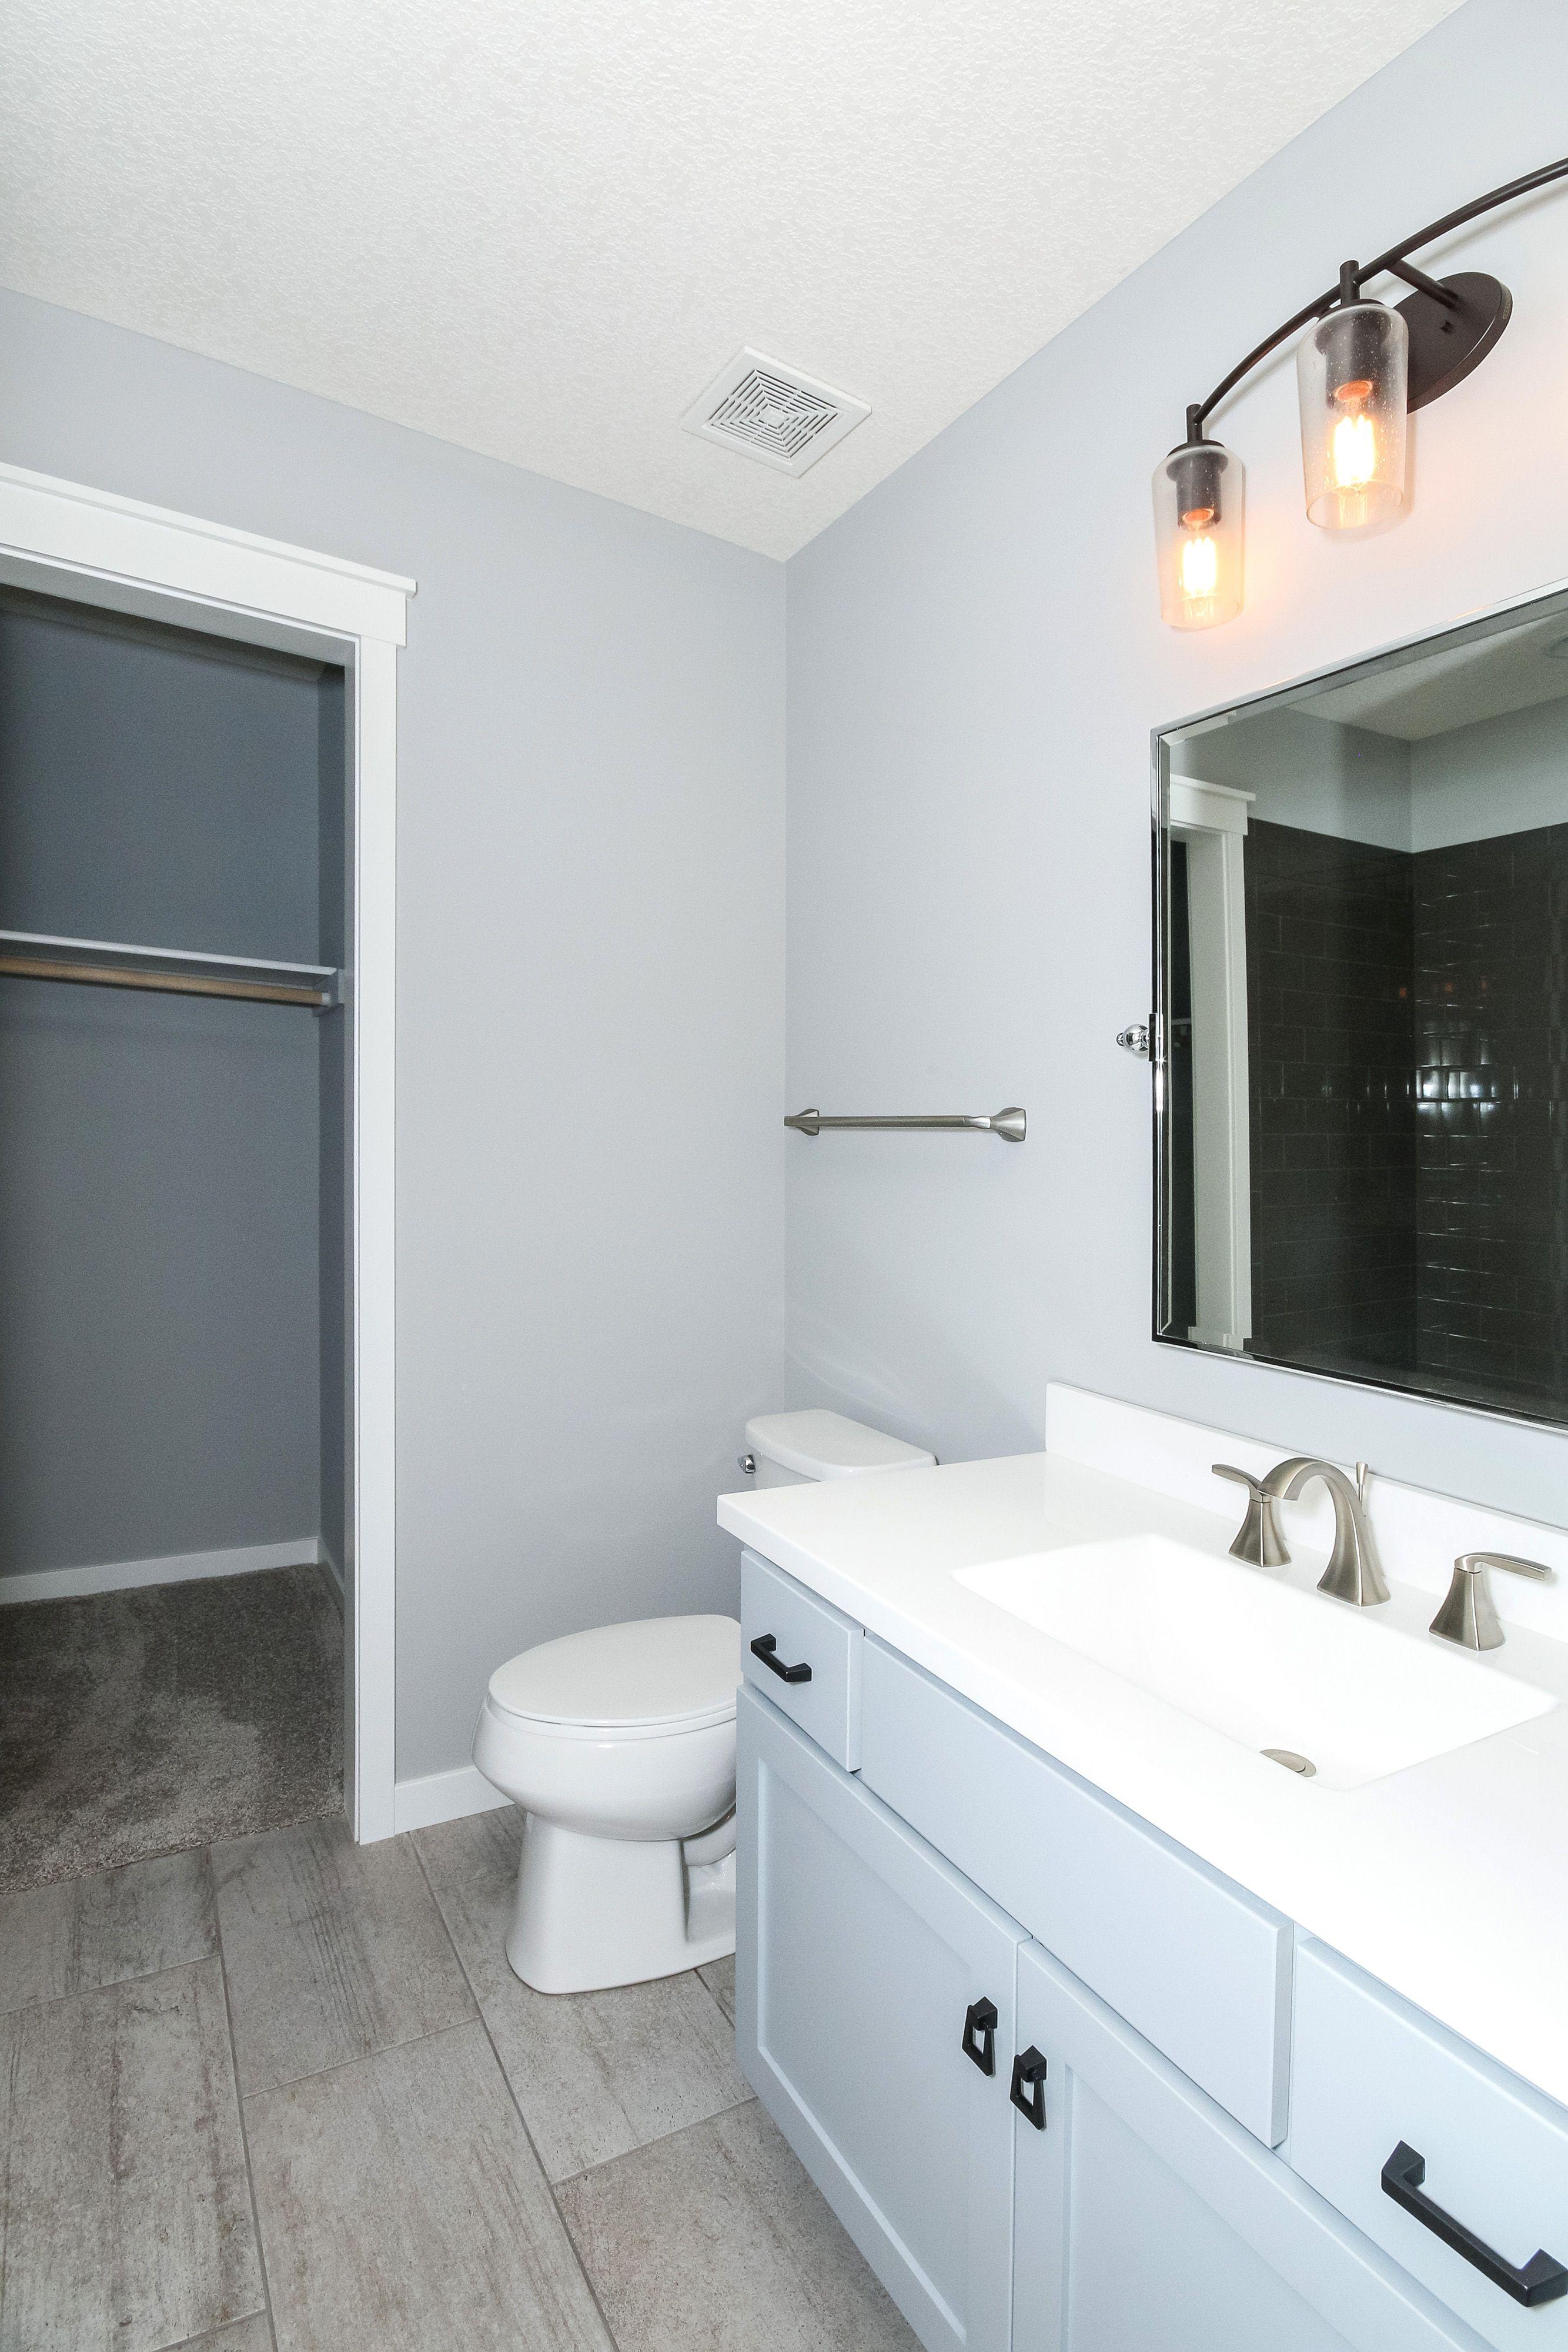 Bedroom 4 Bath Walls Sherwin Williams Sw 0055 Light French Grey Trim 7005 Pure White Ceramic Tile Urban Stone Fog 12x24